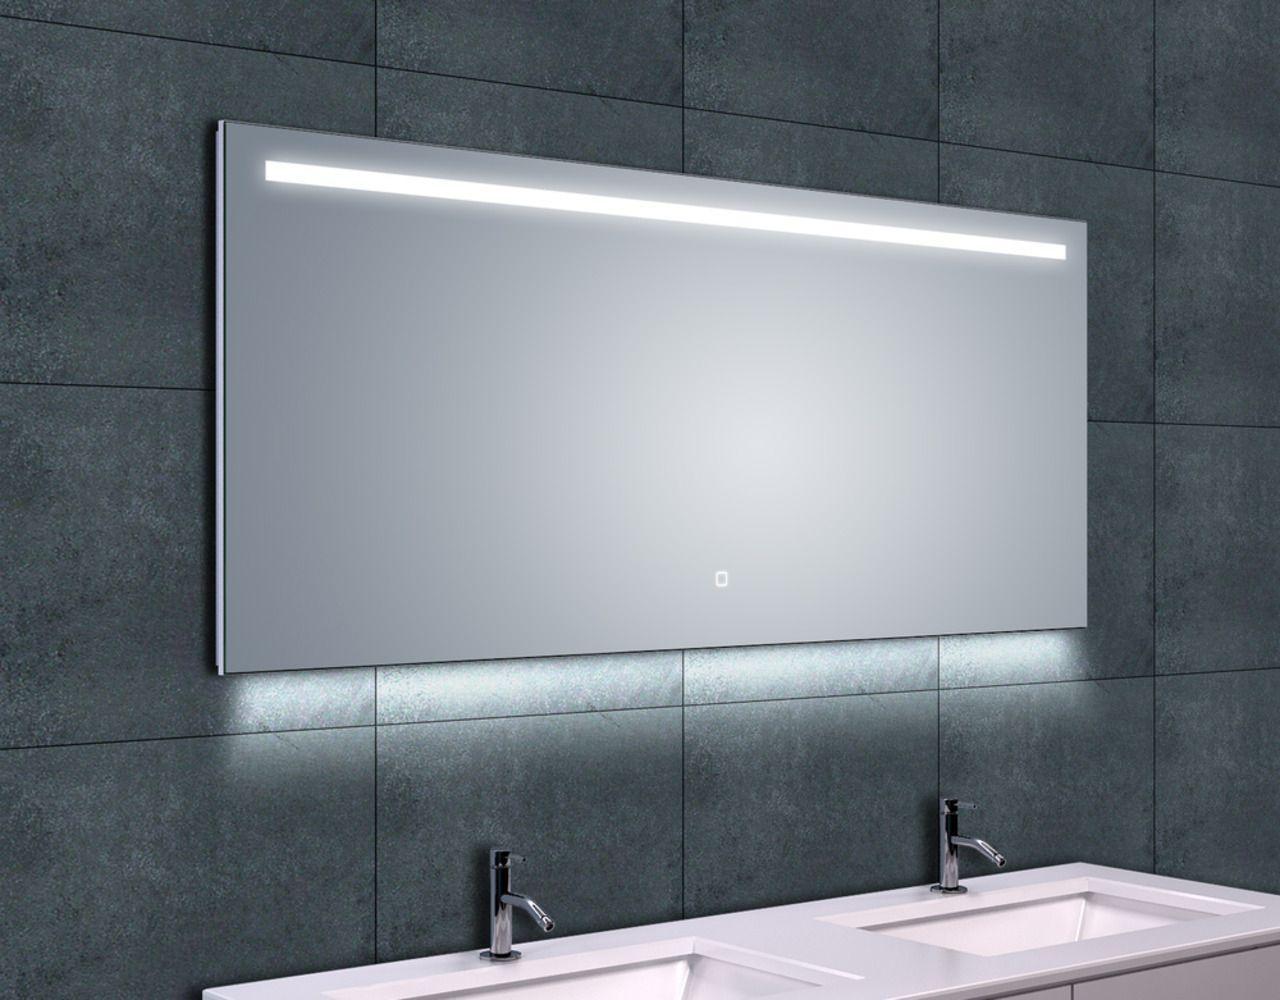 mueller spiegel kopen online internetwinkel. Black Bedroom Furniture Sets. Home Design Ideas